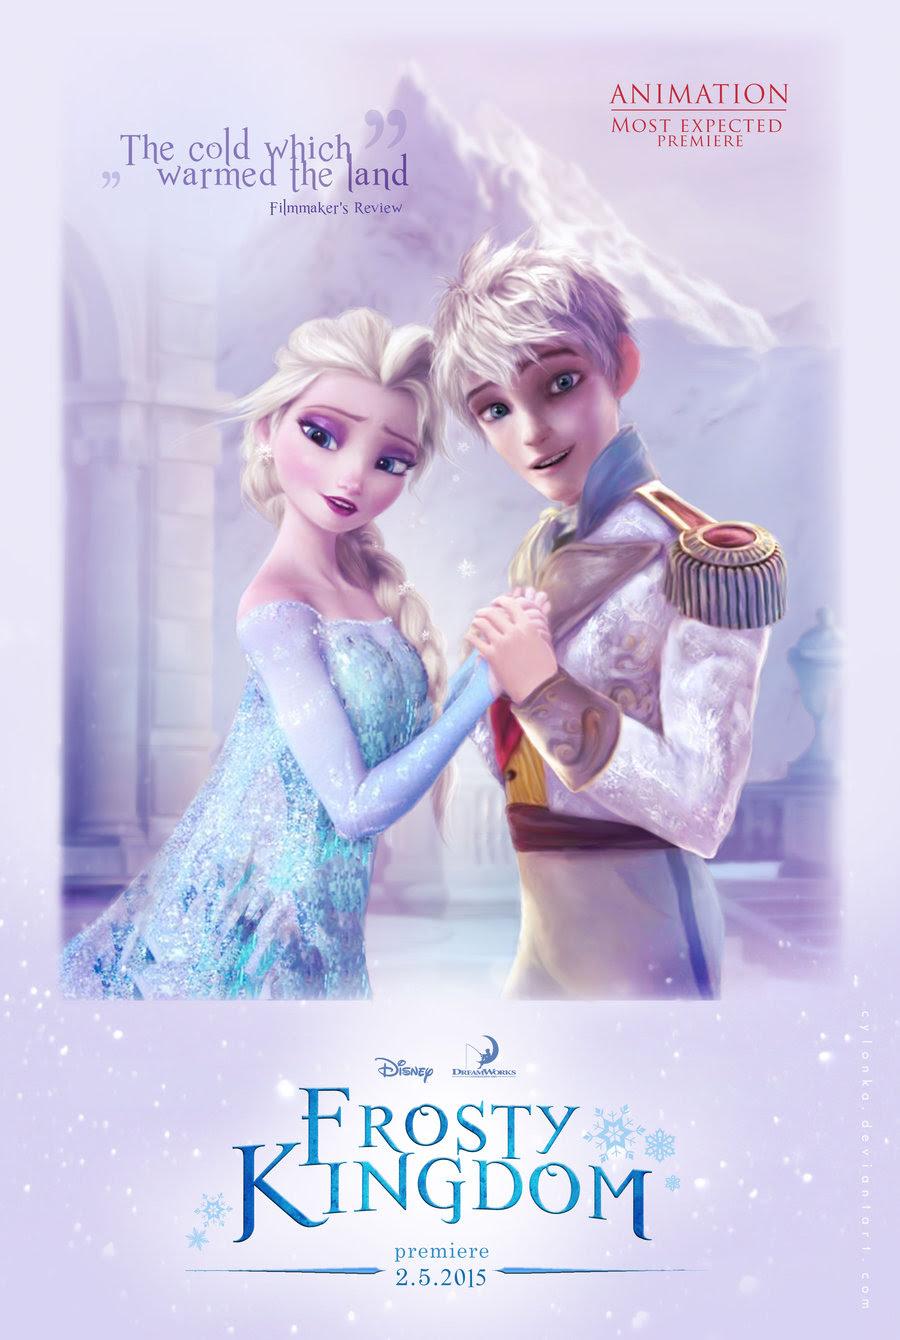 Gambar Frozen Elsa Dan Jack